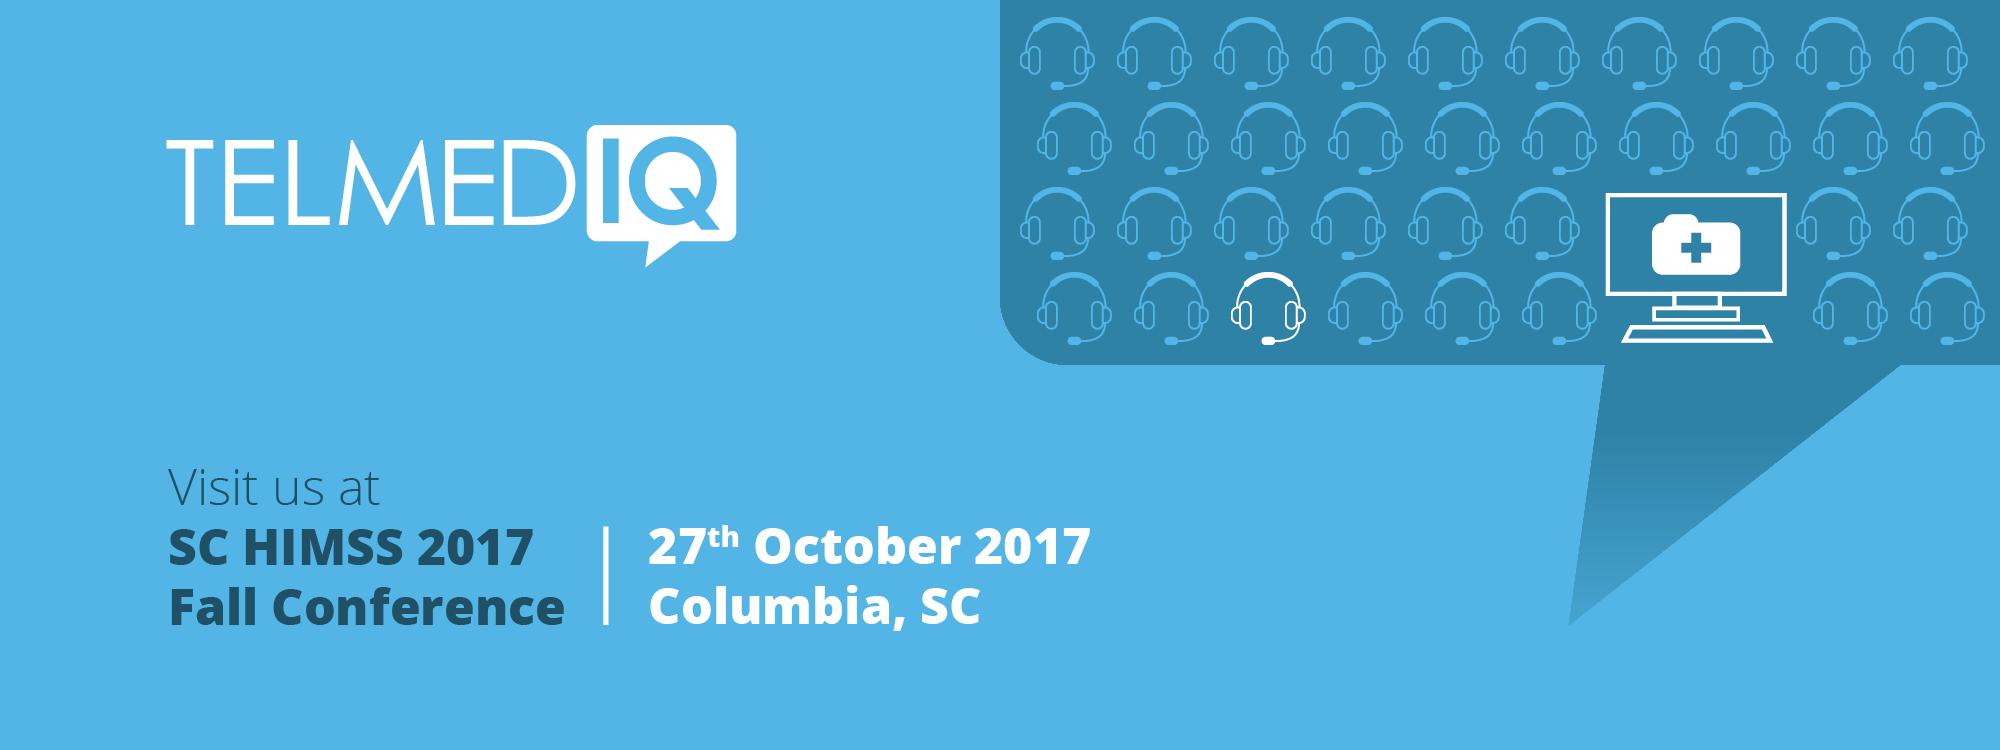 Telmediq Presents Patient-Centered Communication at SC HIMSS 2017